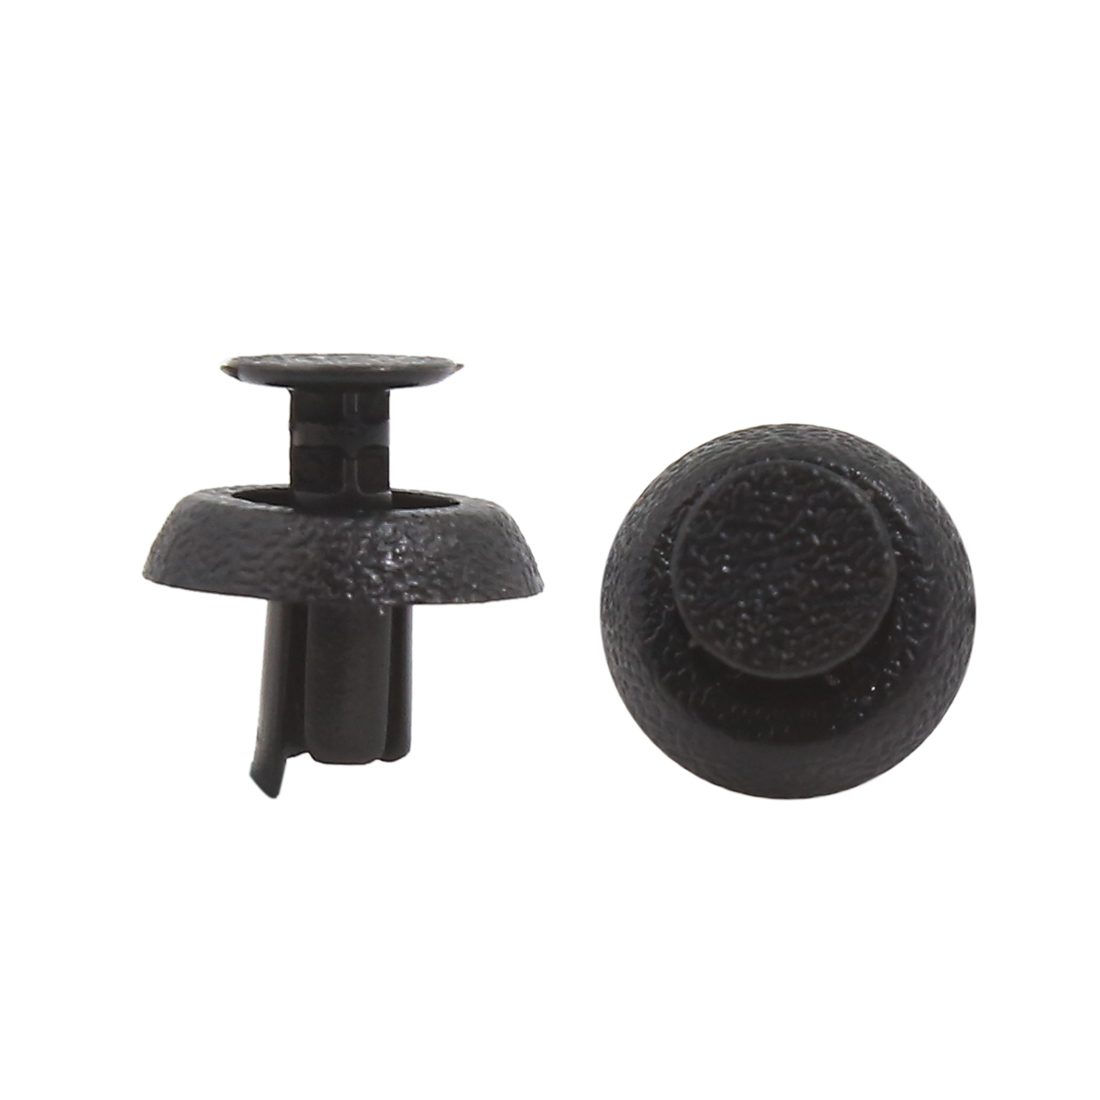 40 Pcs Black Plastic Rivets Fasteners 6.5mm Dia Hole for Car Auto Bumper Fender